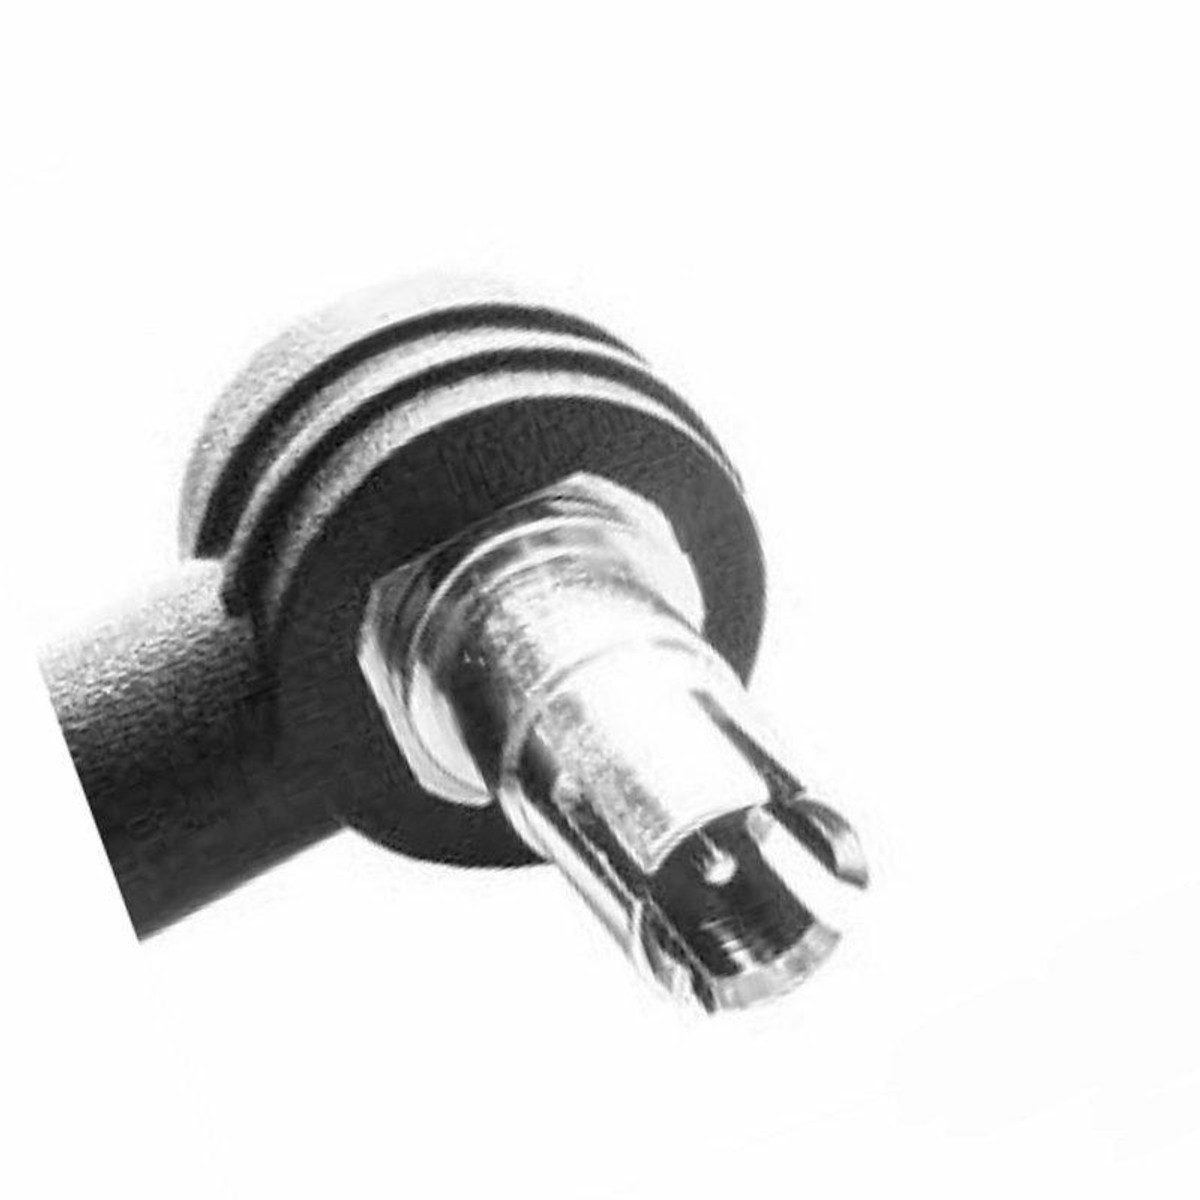 Wilson Electronics weBoost Wilson Adapter Cable for Motorola, Merlin, Samsung, LG, HTC, Novatel - 359909